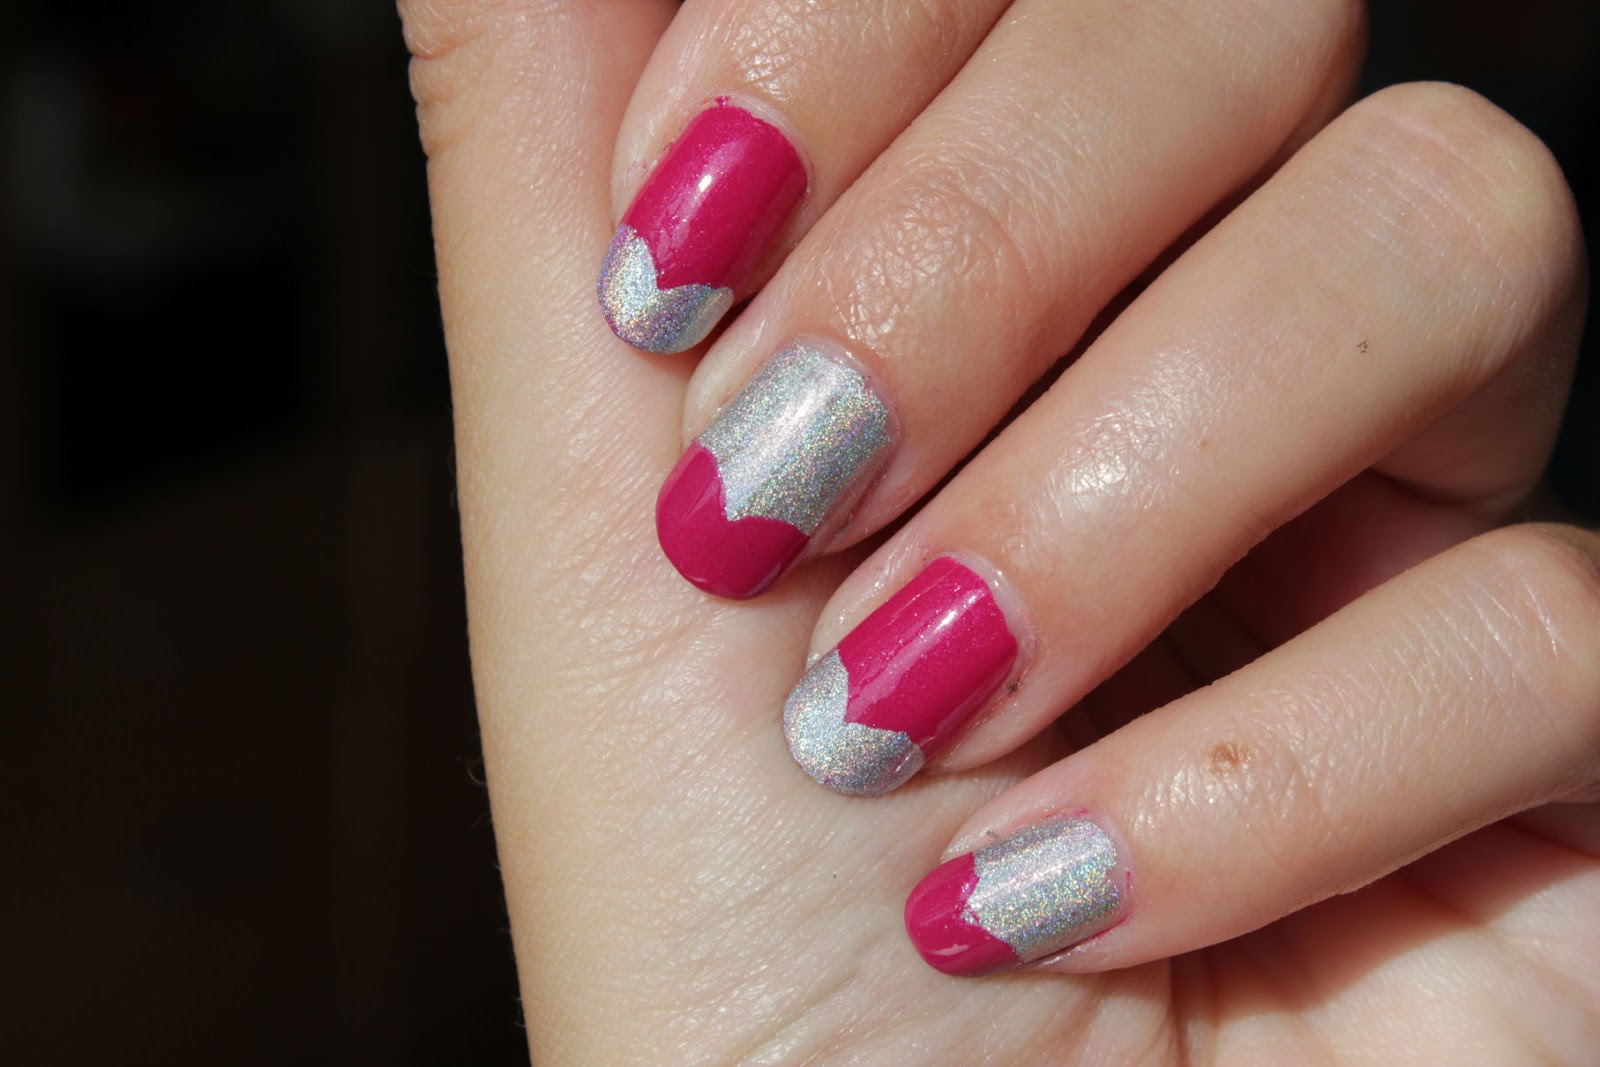 http://lacquediction.blogspot.de/2014/10/essence-french-manicure-creative-tip.html